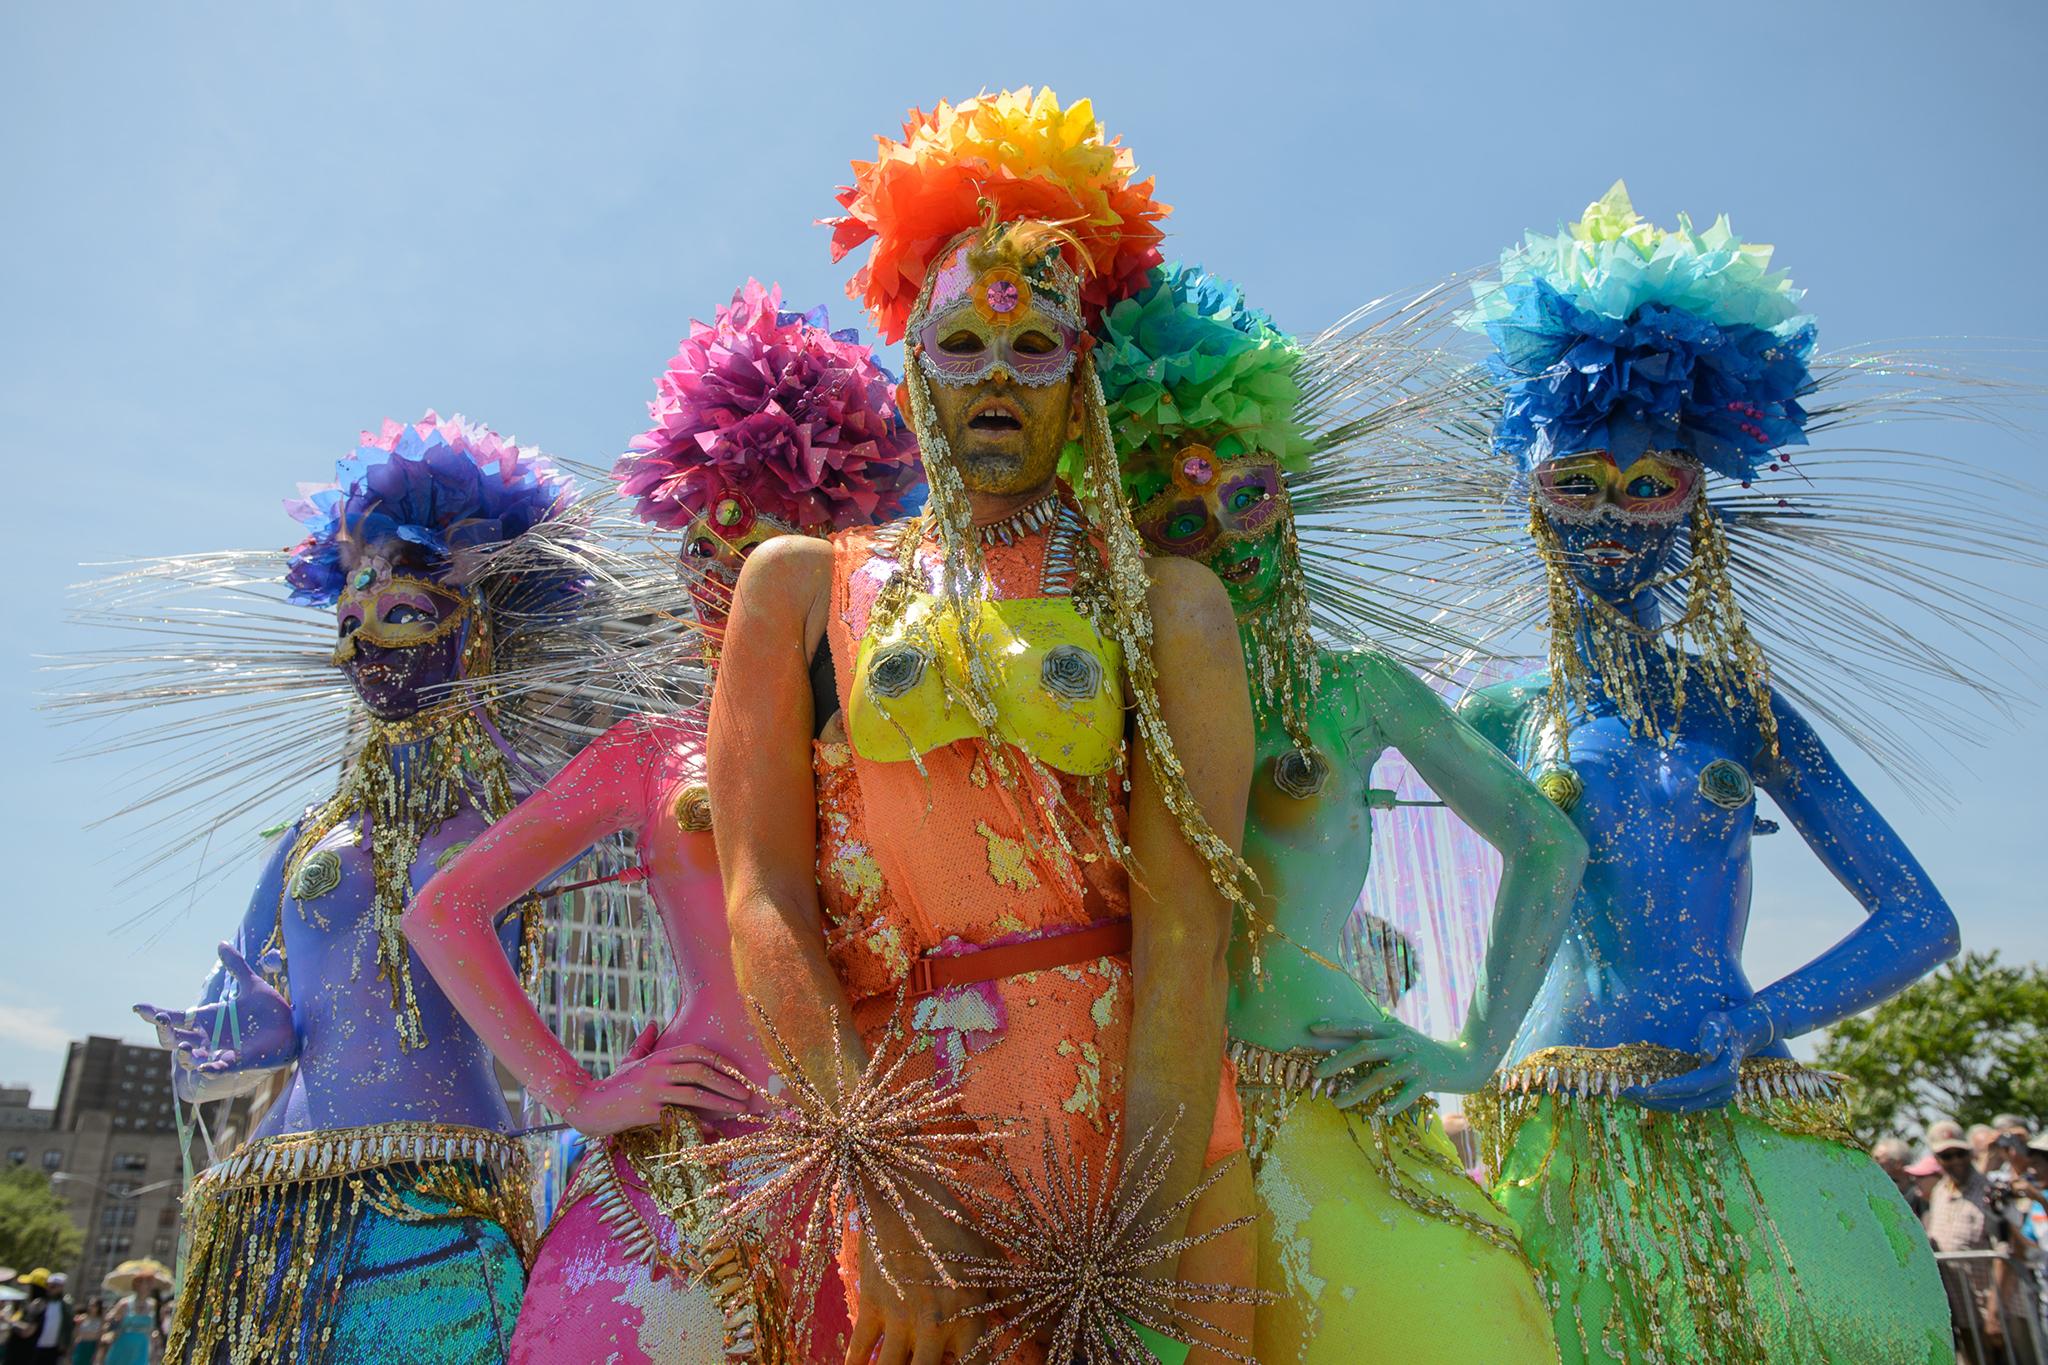 The Mermaid Parade hits Coney Island this Saturday (2015)